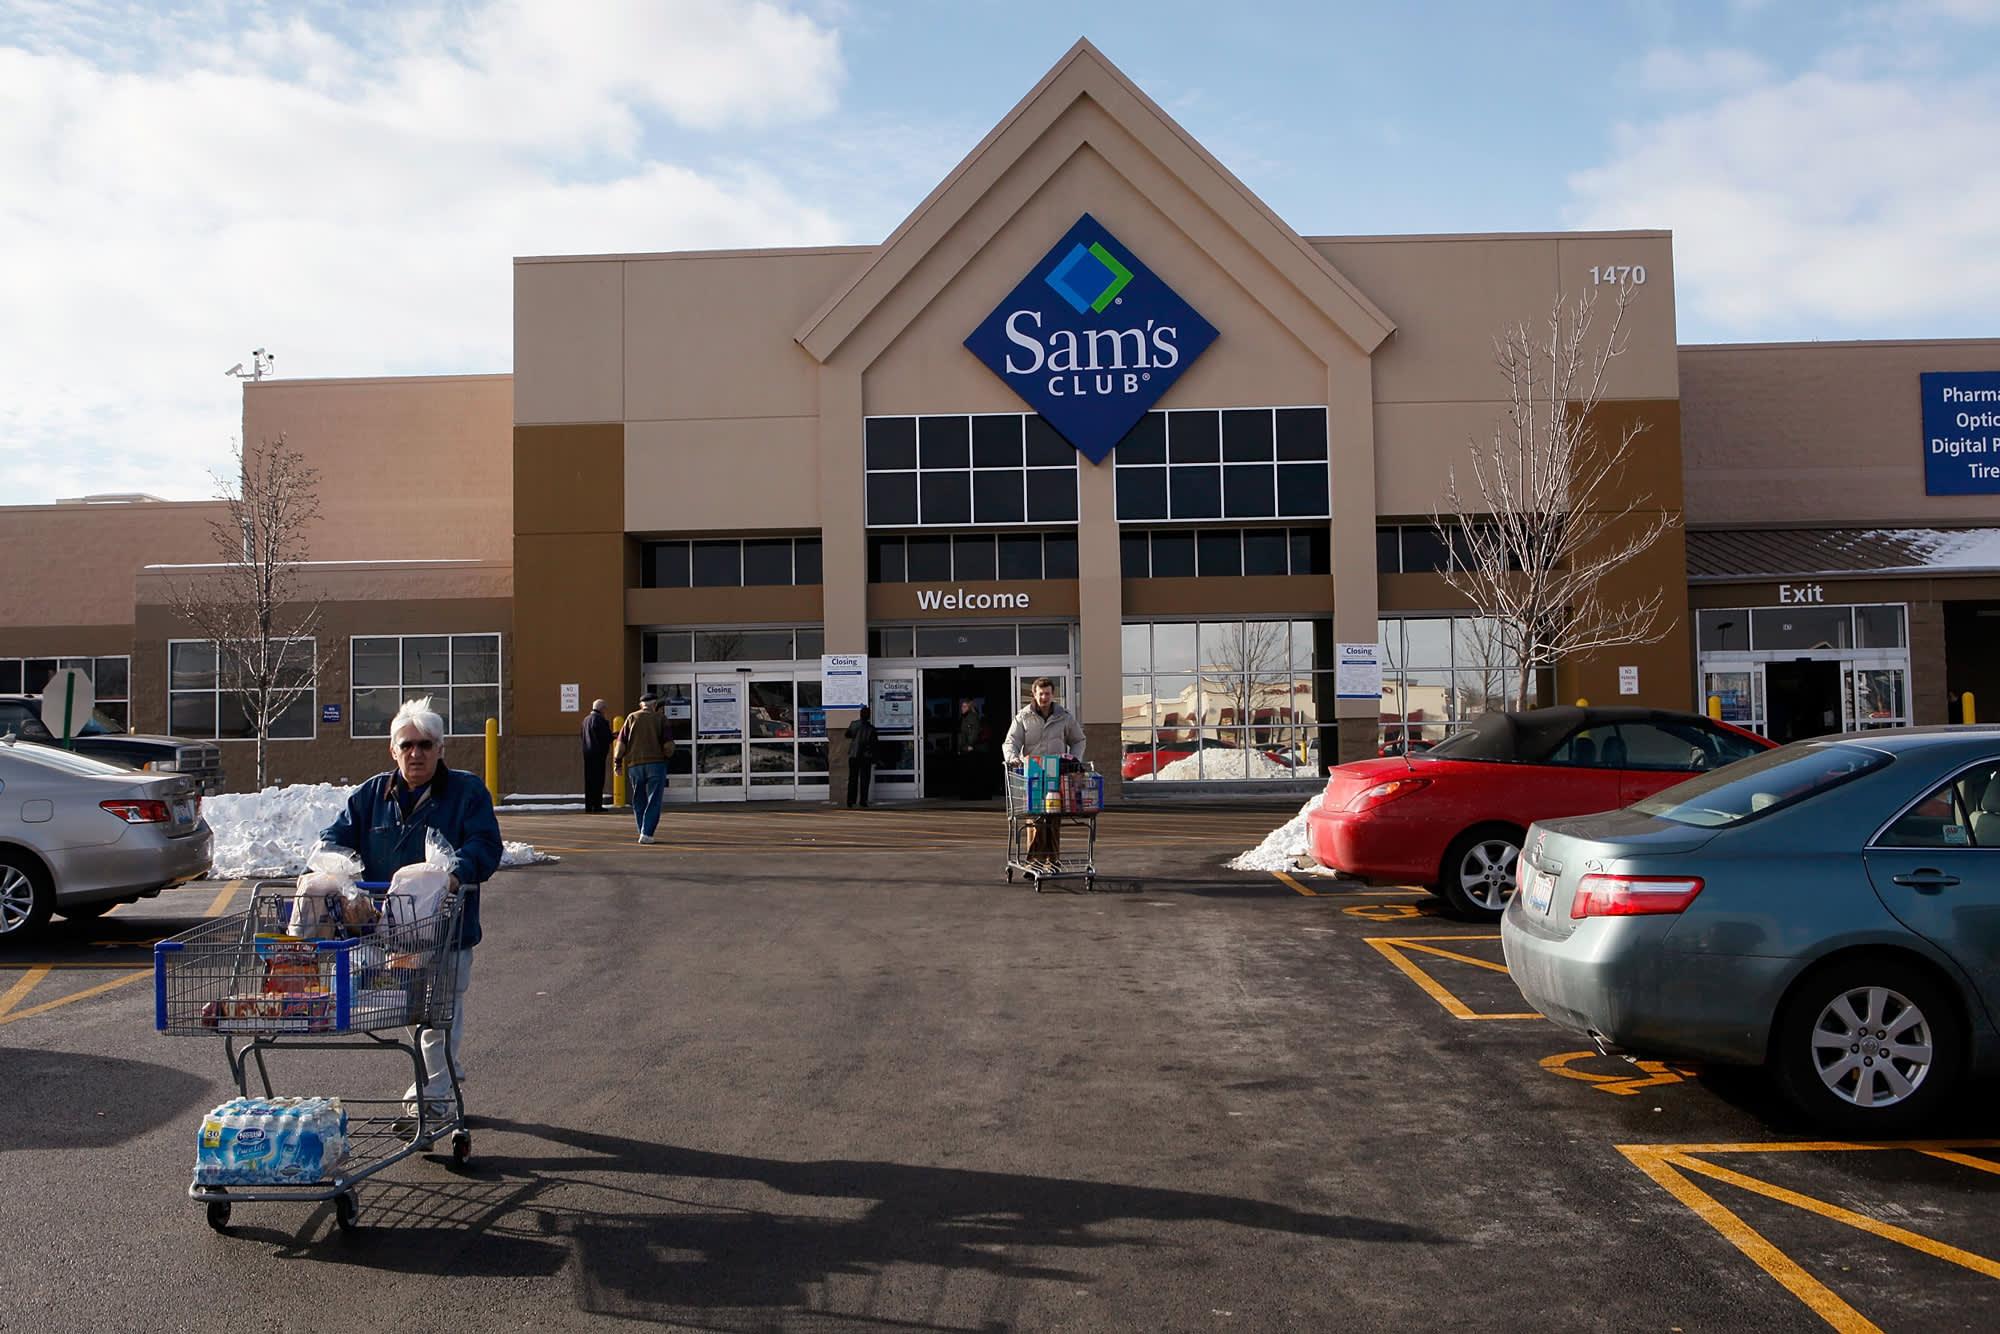 Walmart to shutter 63 Sam's Club locations